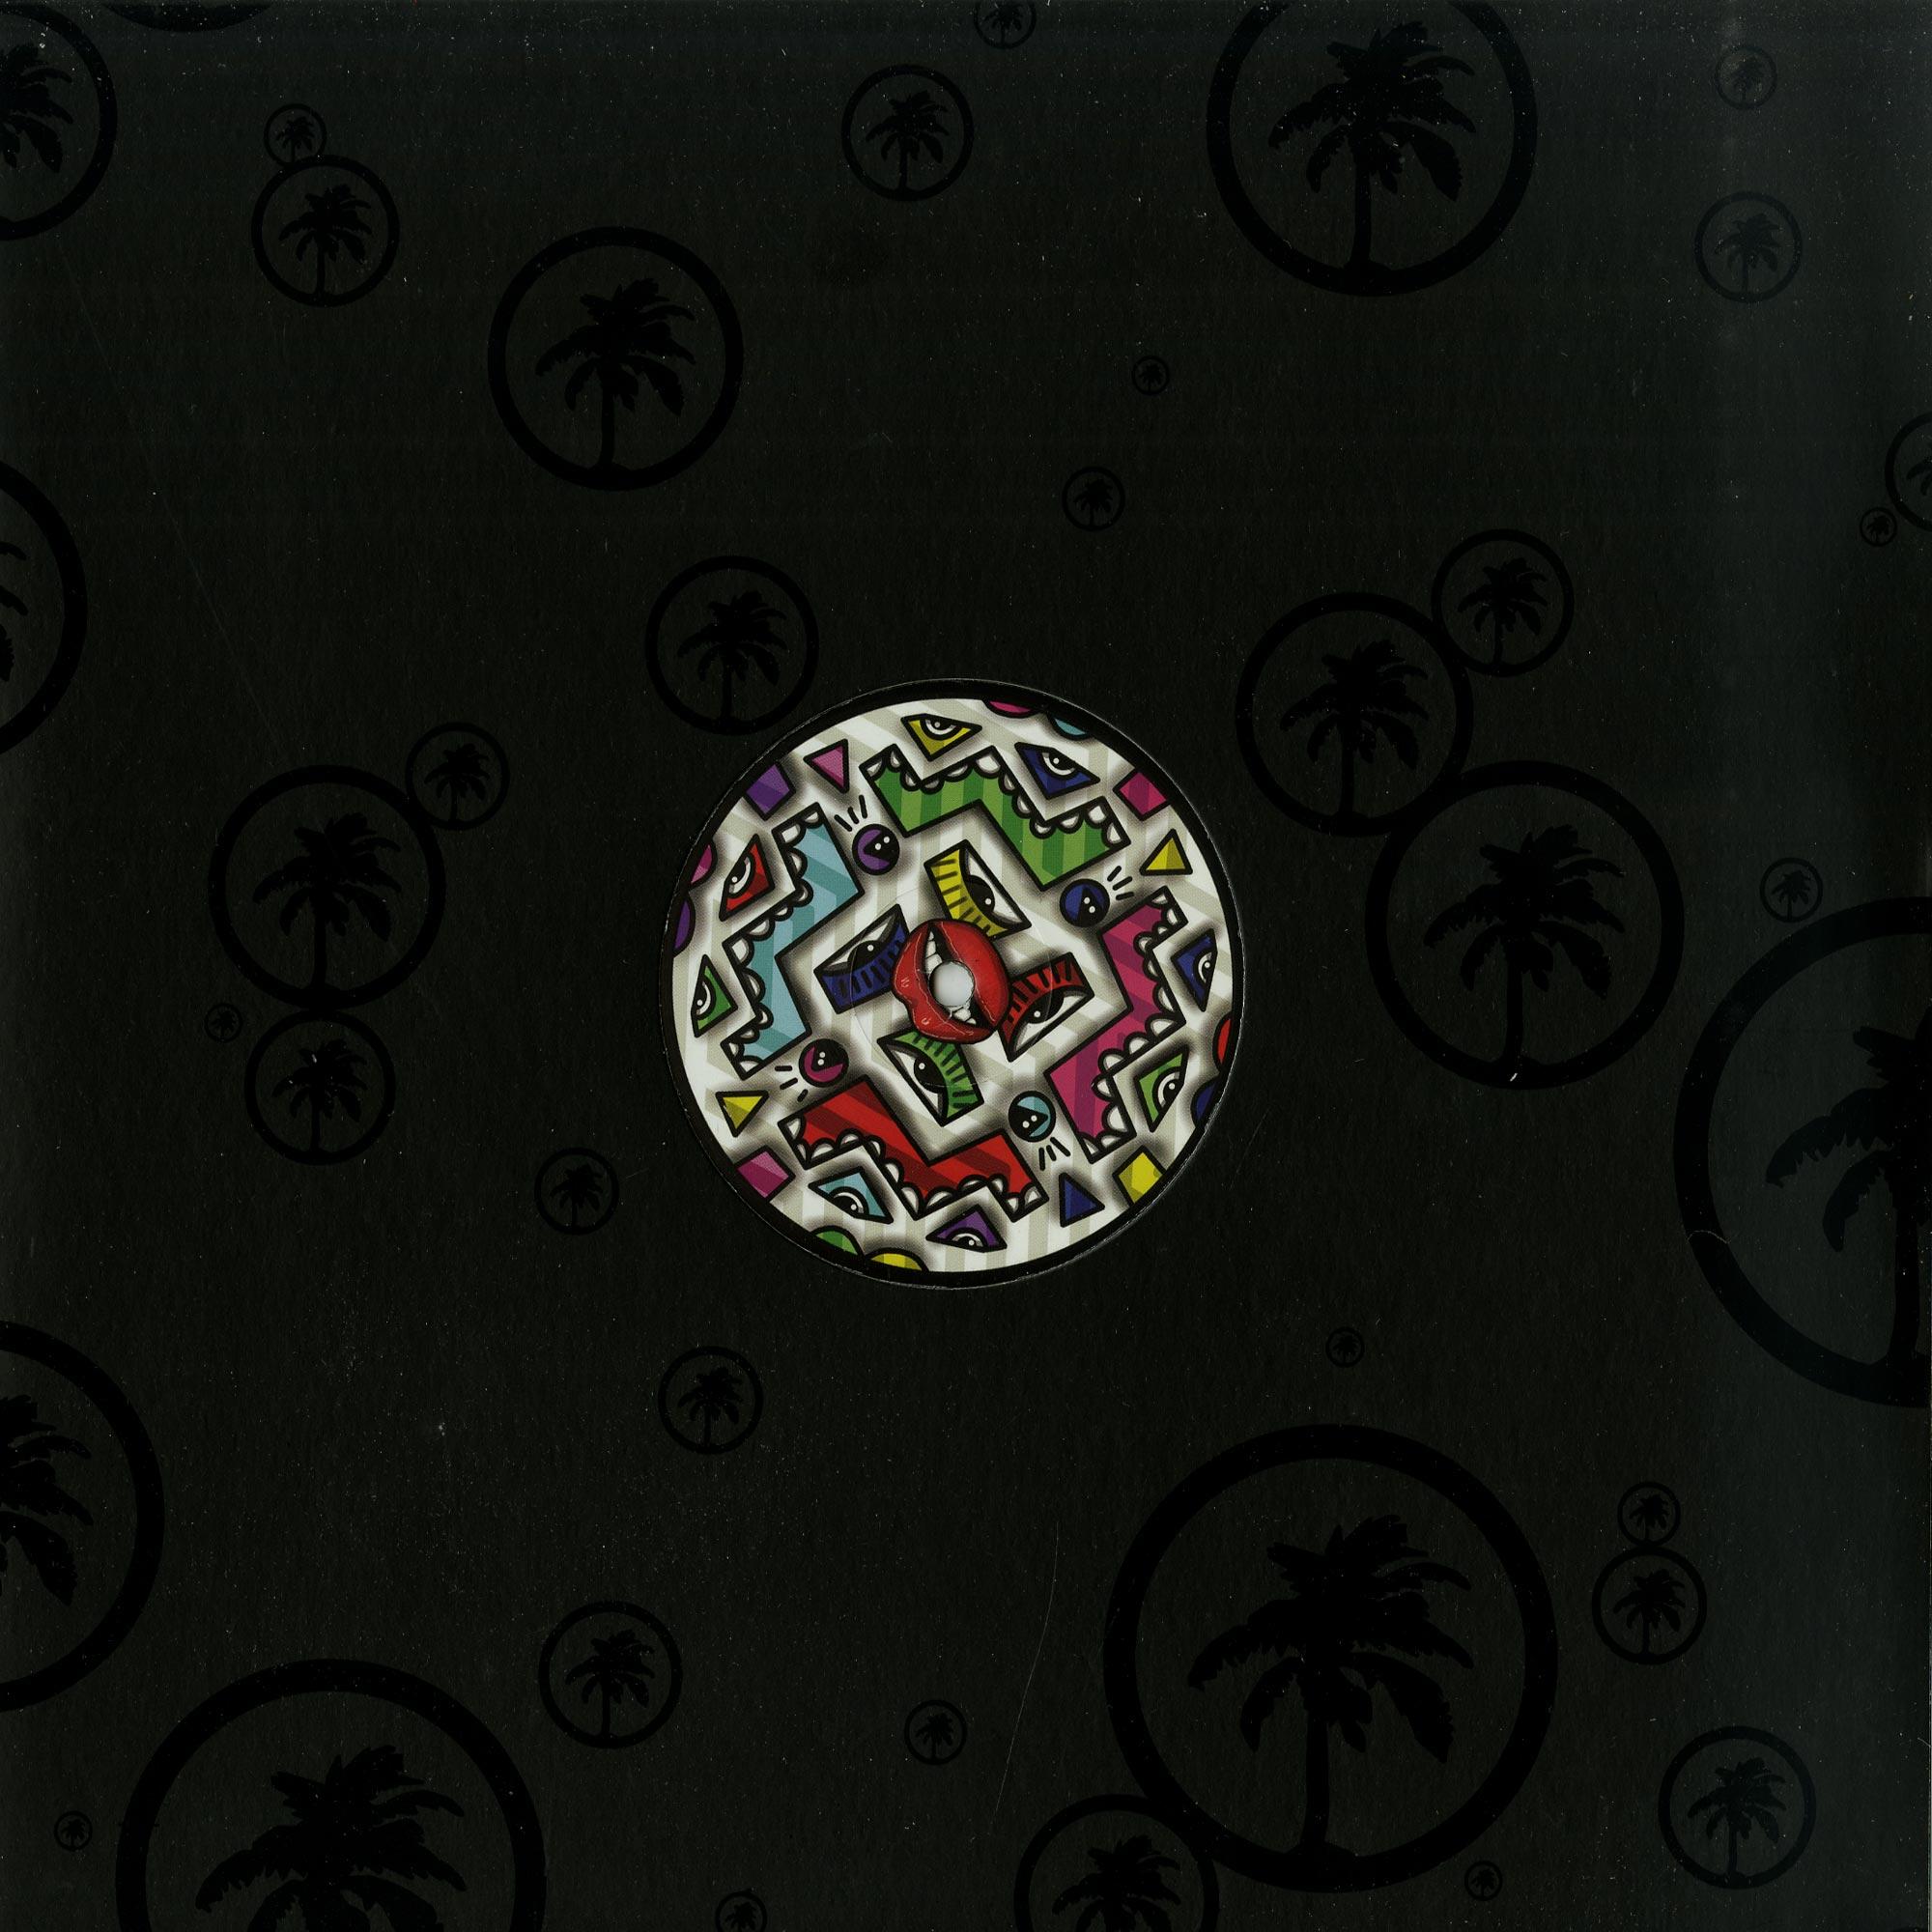 DJ Sneak & Jesse Perez feat. KE - Back & Forth